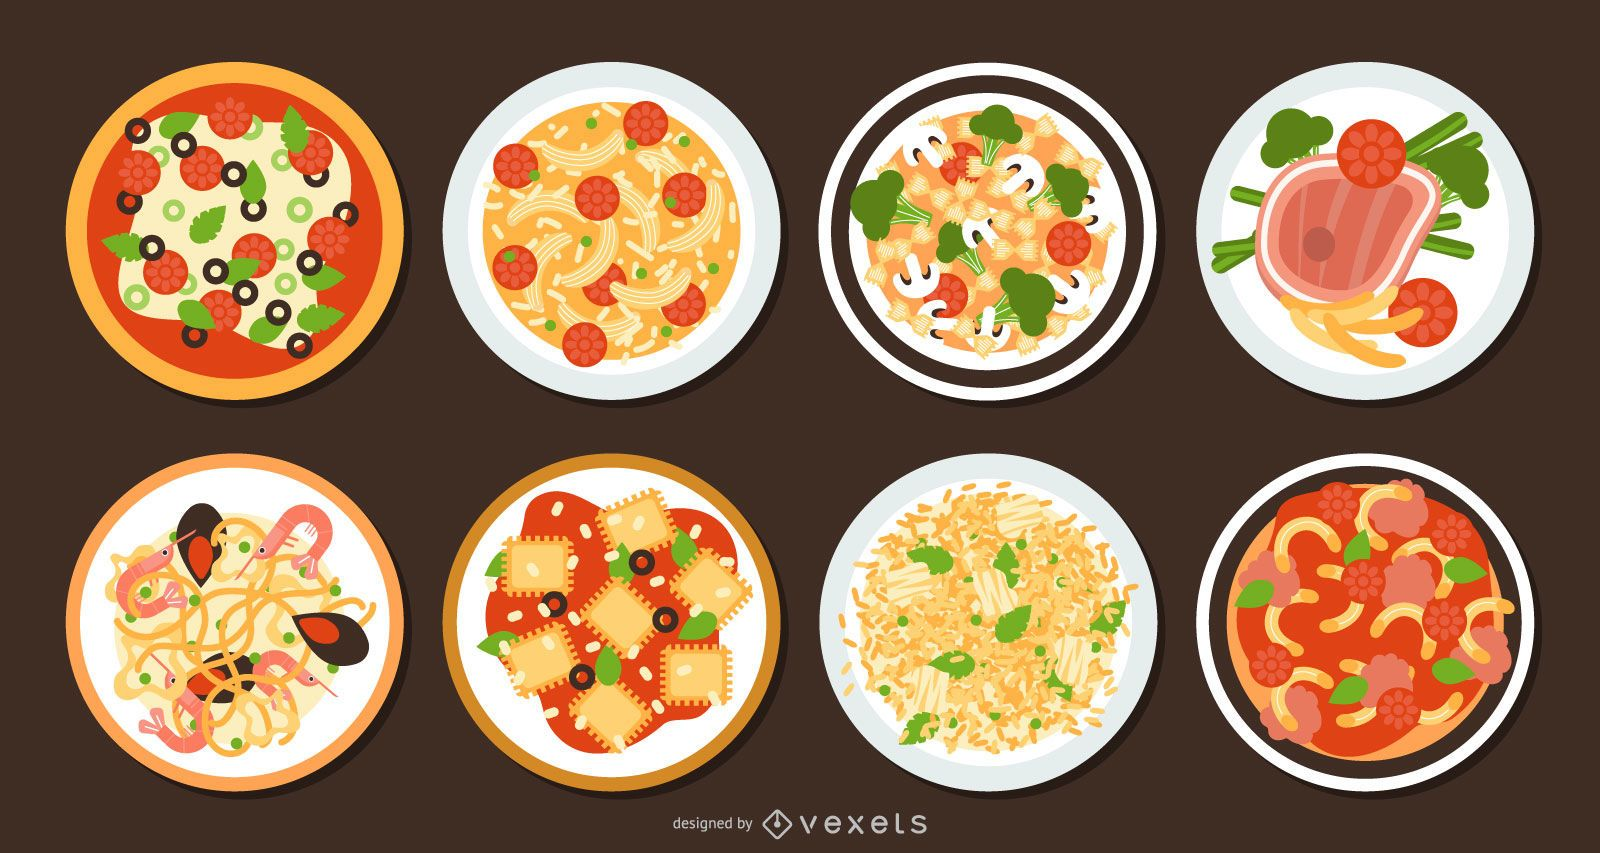 Conjunto de design plano de comida italiana tradicional